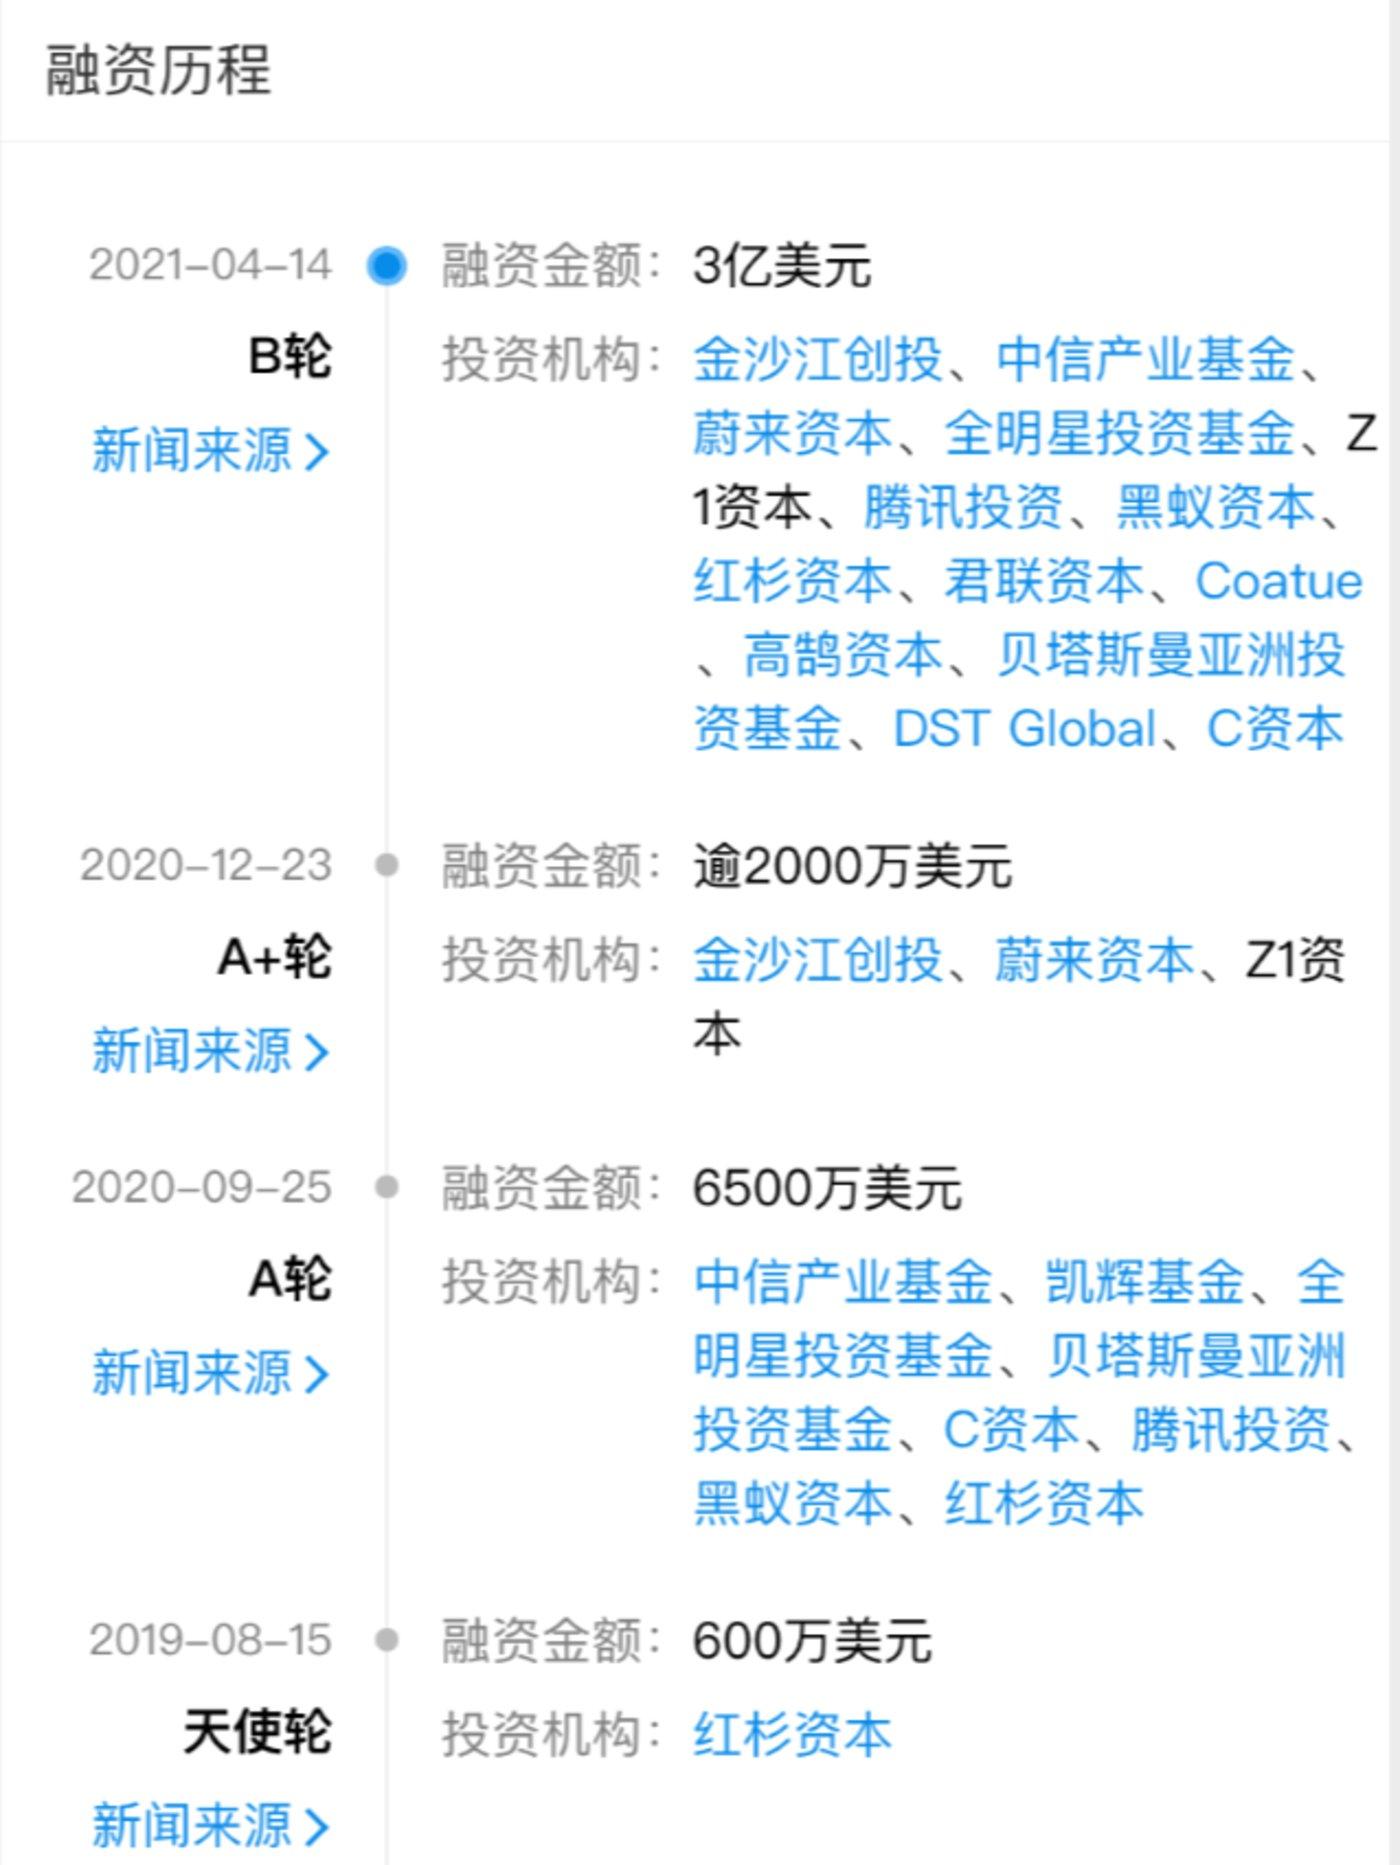 FITURE融资历程 图源 / 企查查